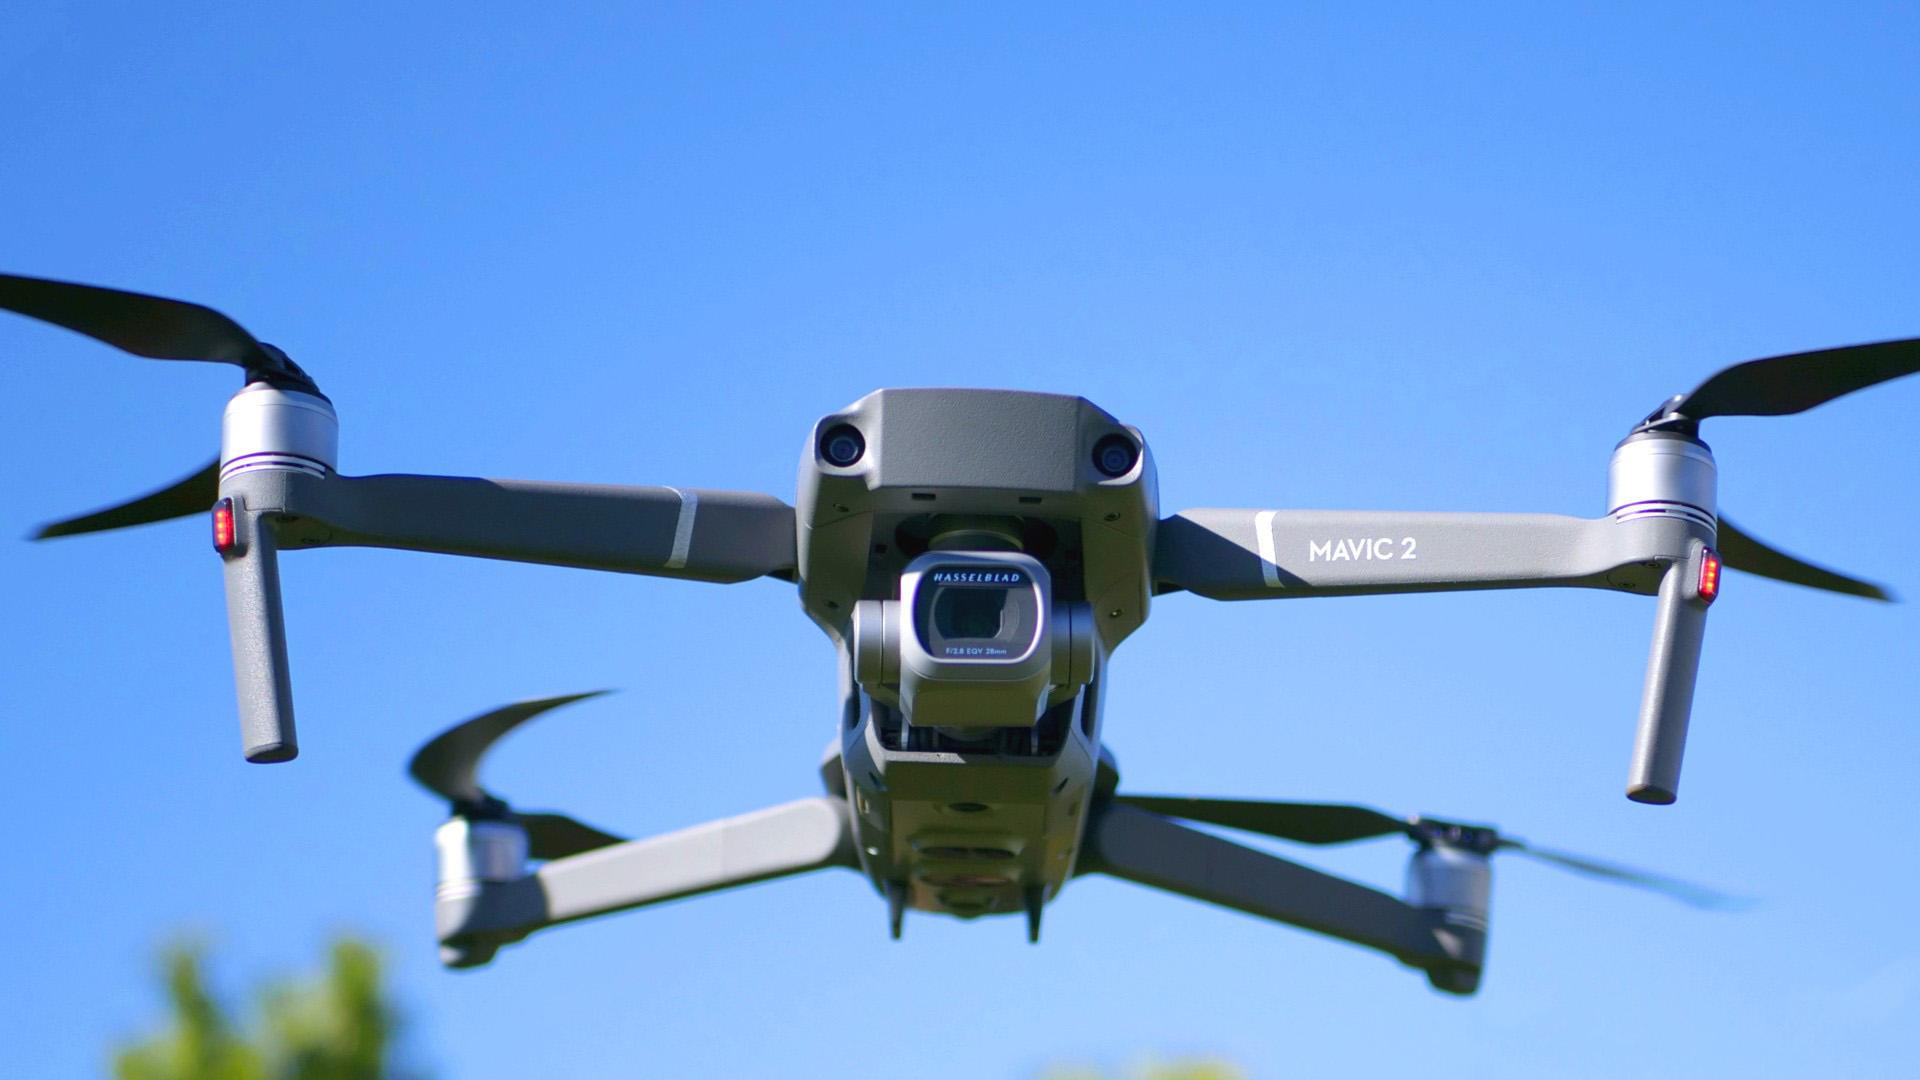 Sewa Drone Belitung DJI Mavic 2 Pro